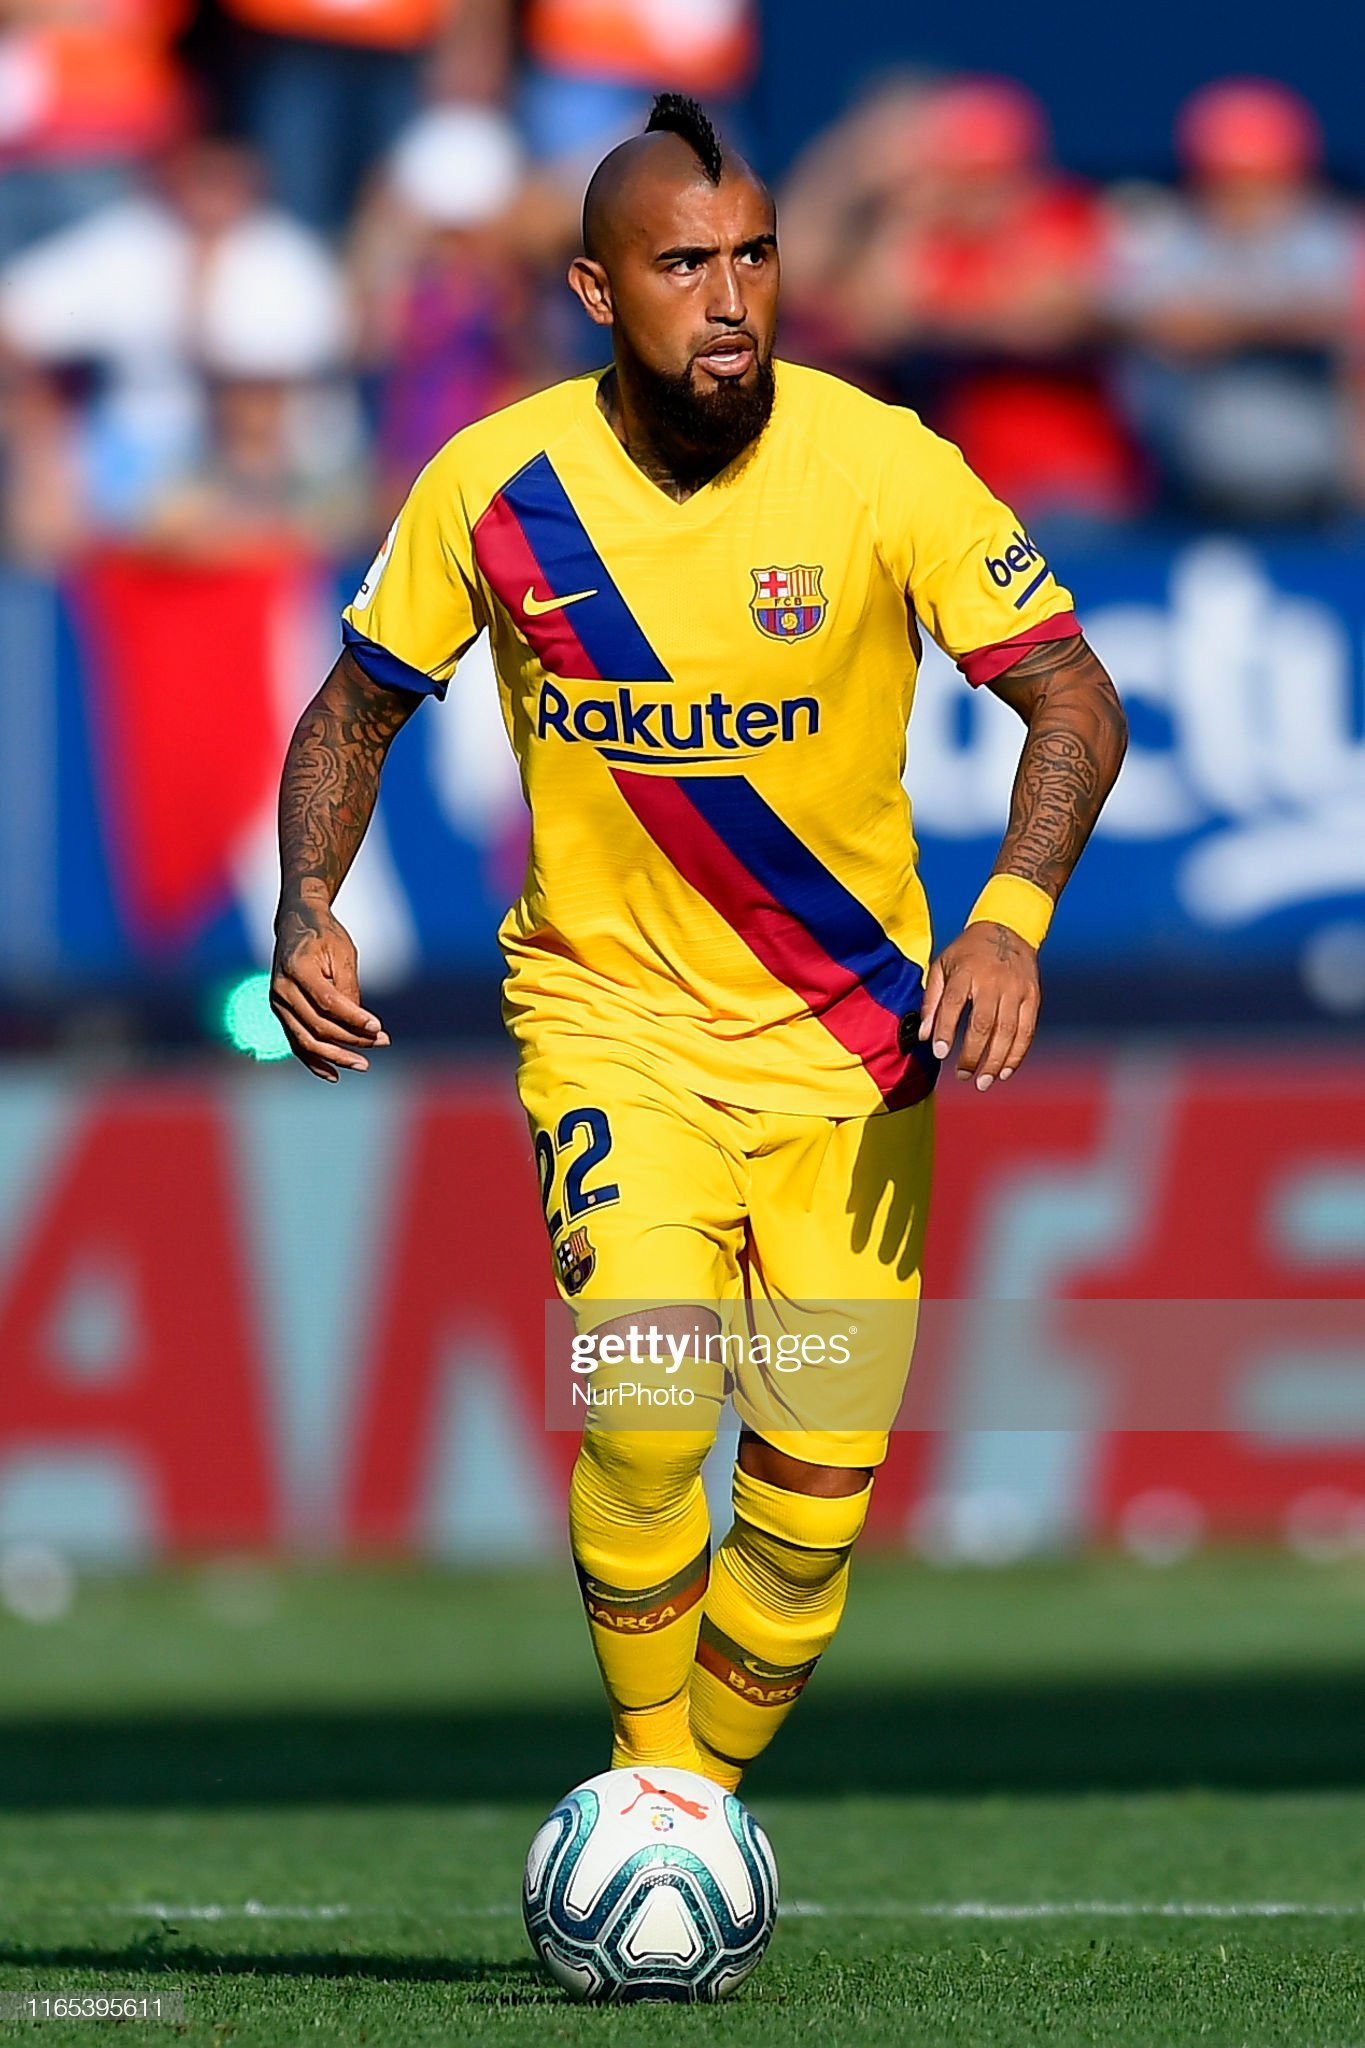 صور مباراة : أوساسونا - برشلونة 2-2 ( 31-08-2019 )  Arturo-vidal-of-barcelona-in-action-during-the-liga-match-between-ca-picture-id1165395611?s=2048x2048